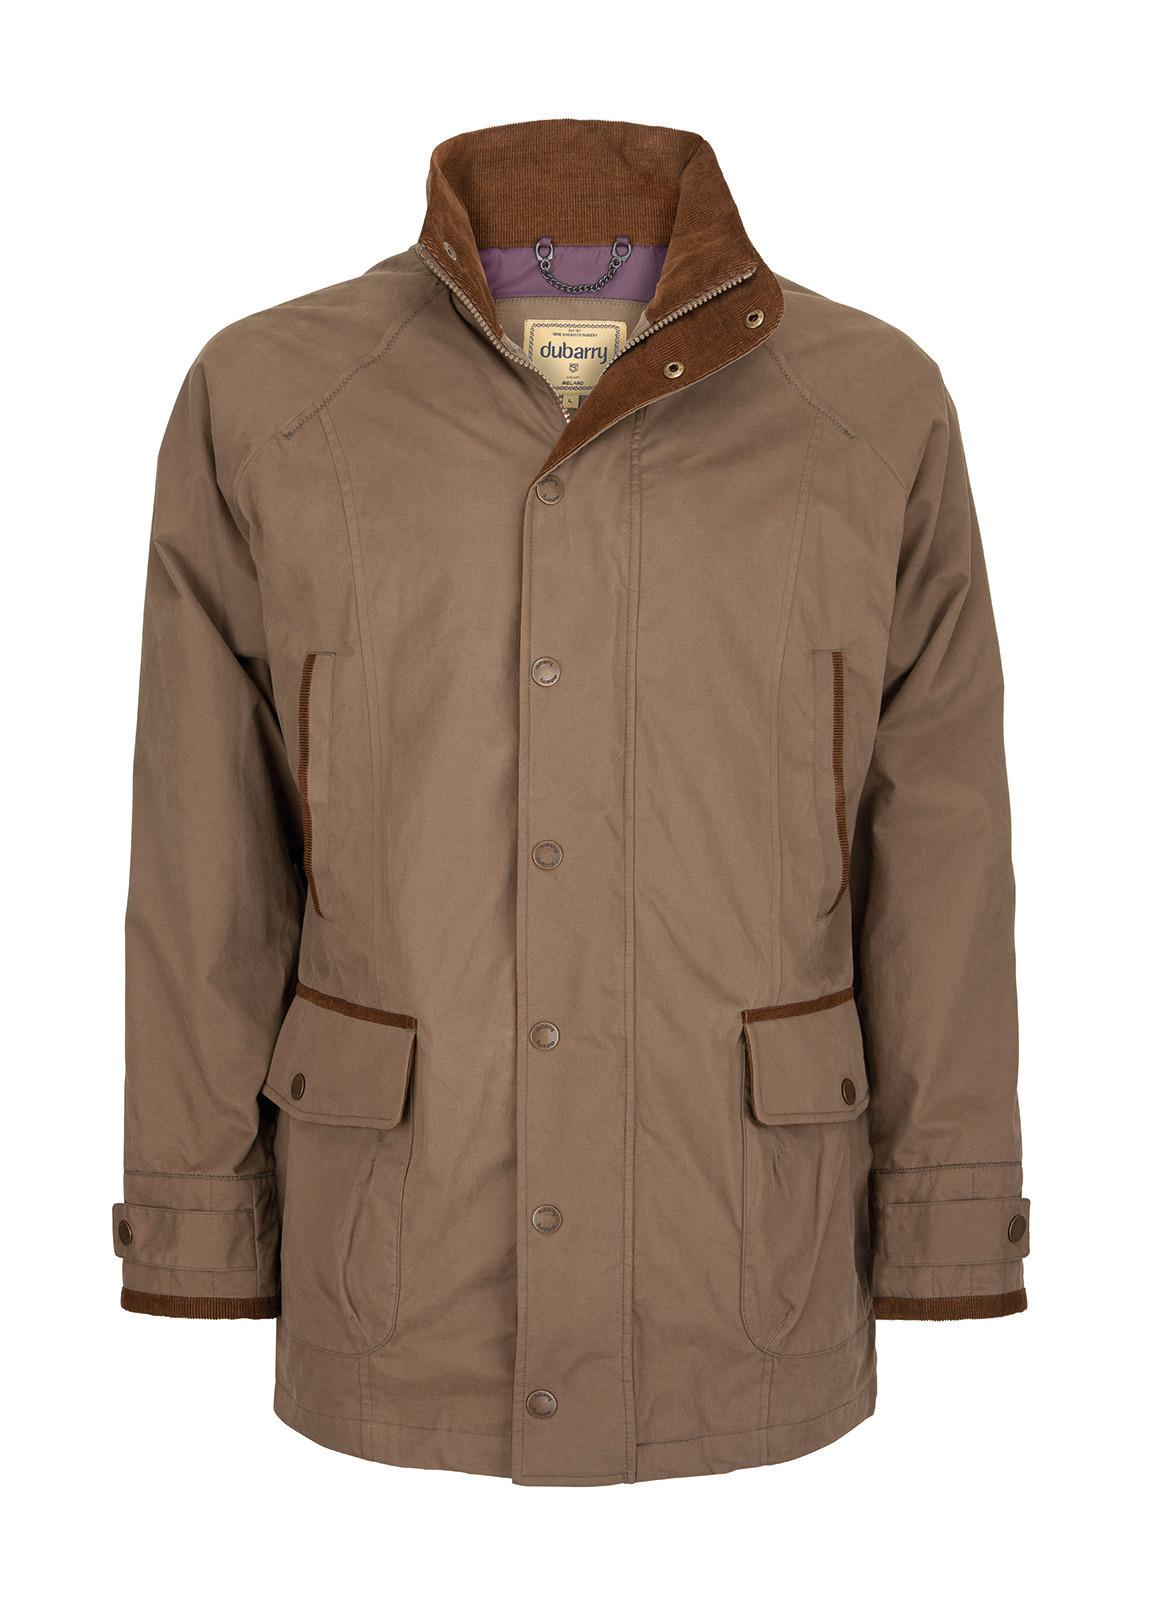 Dubarry_Connell lightweight jacket - Salmon Sky_Image_2